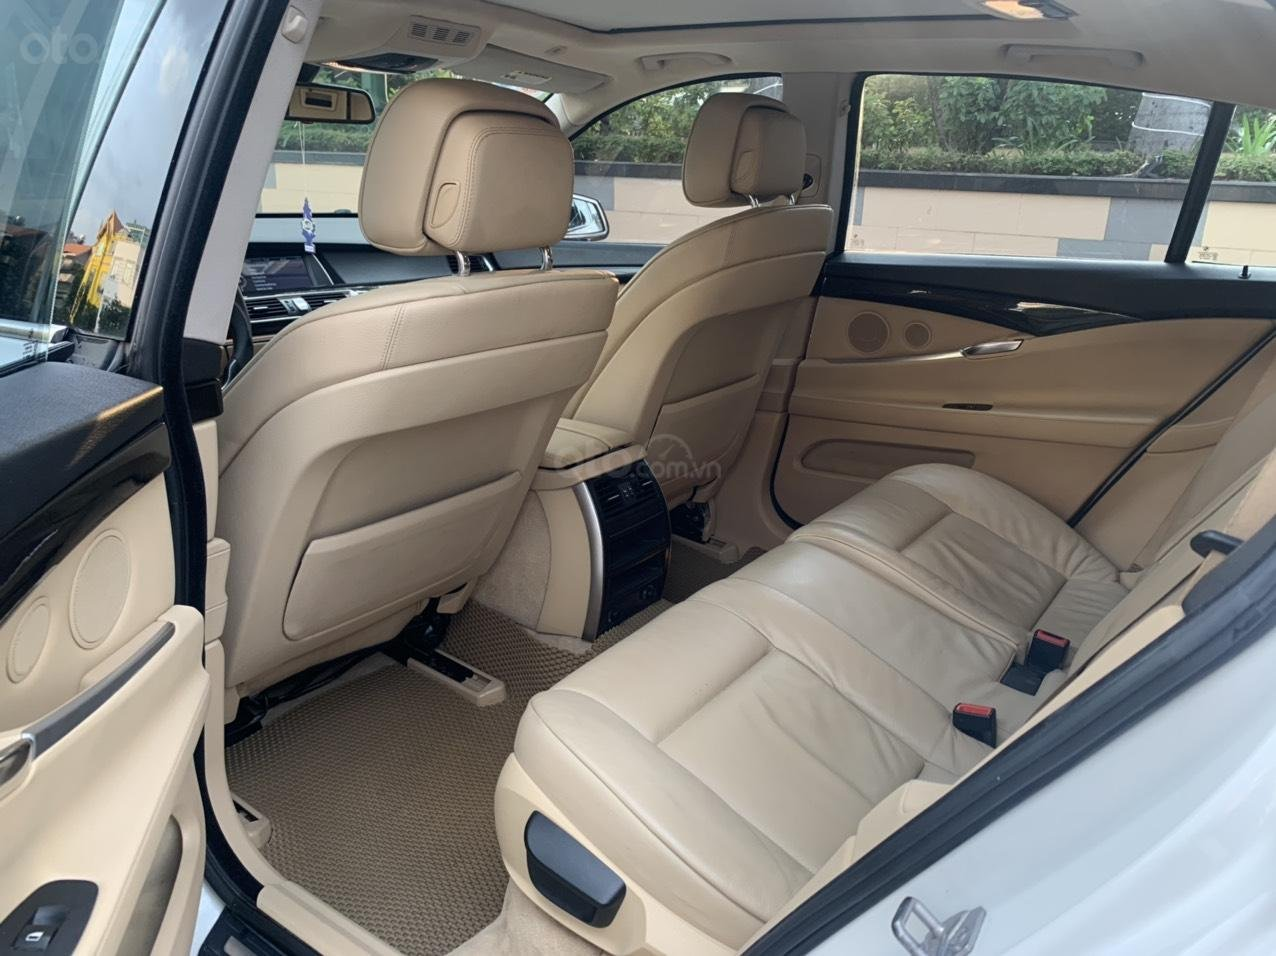 Cần bán gấp BMW 535GT SX 2011, giá 960 triệu (10)